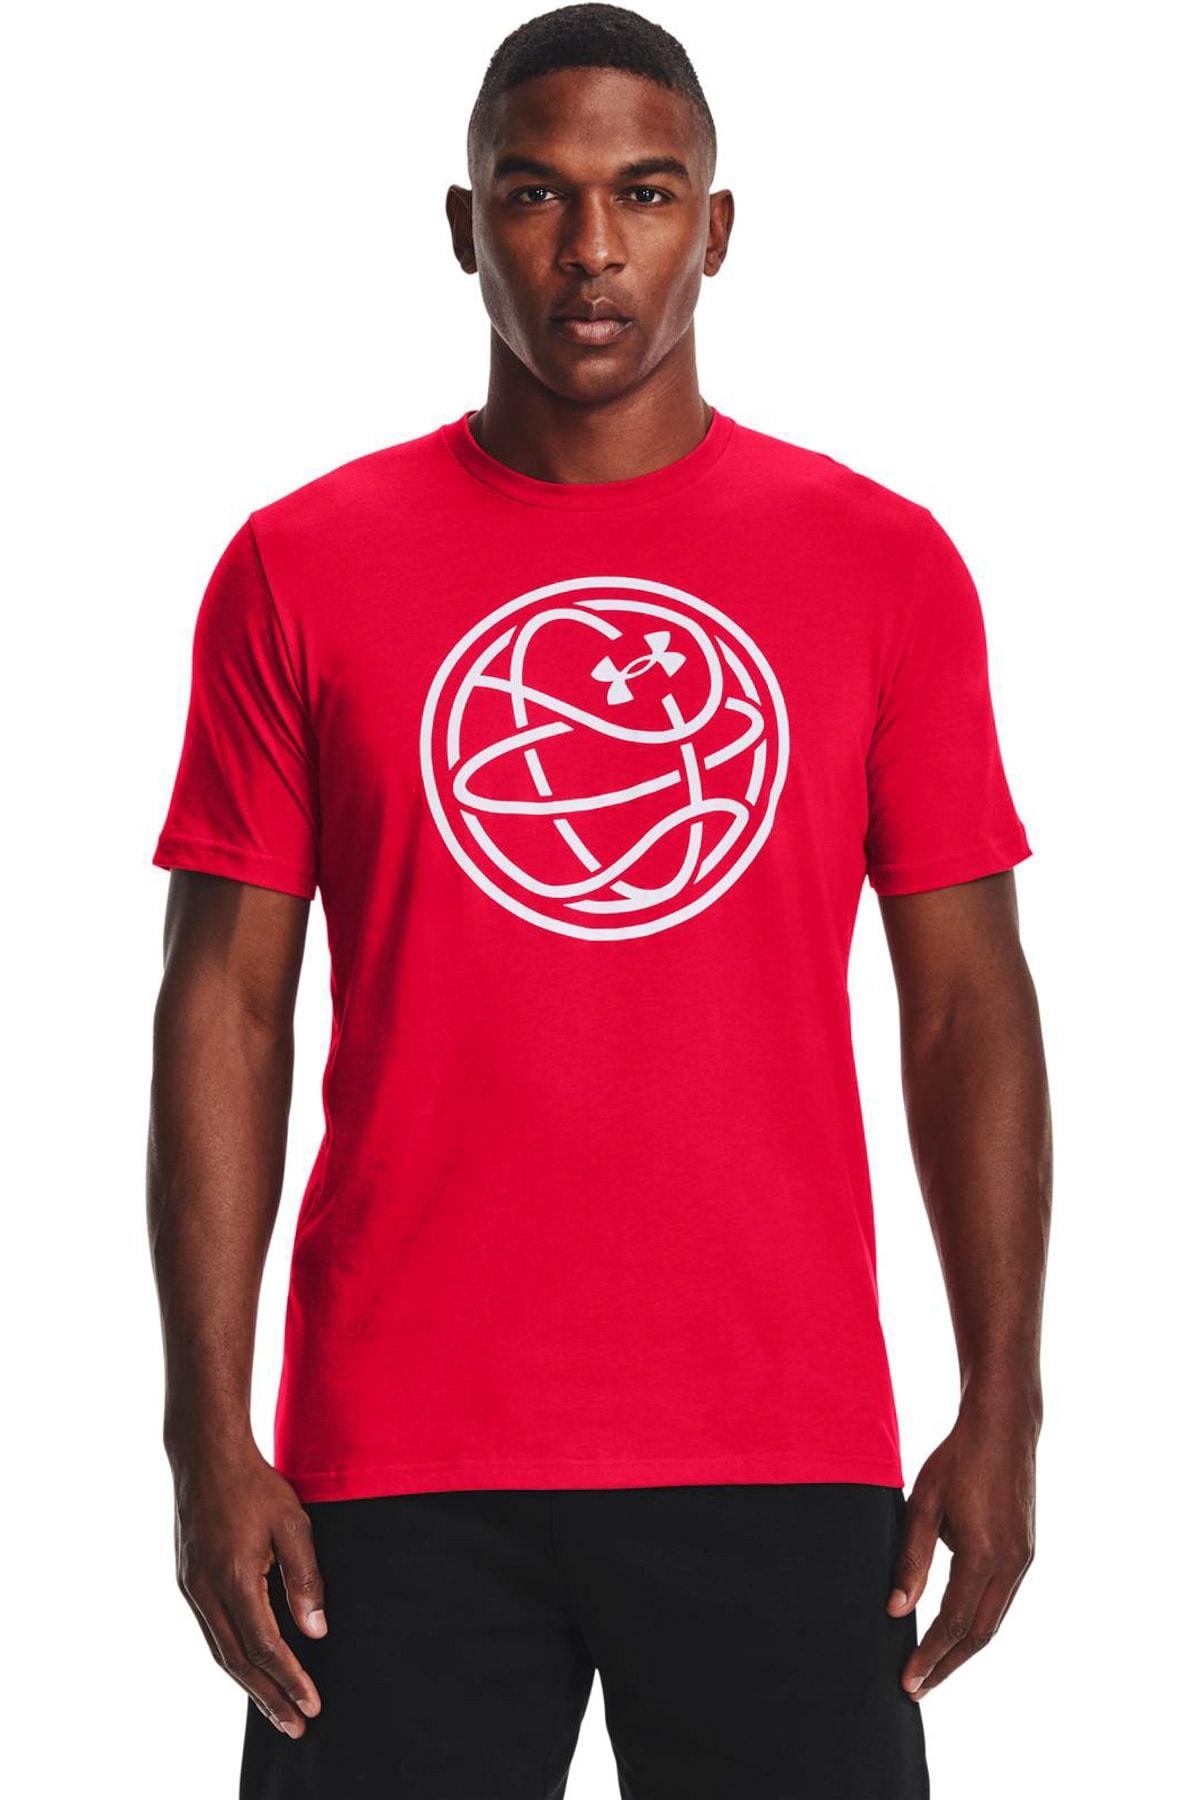 Under Armour Erkek Spor T-Shirt - UA HOOPS ICON TEE - 1361920-600 1